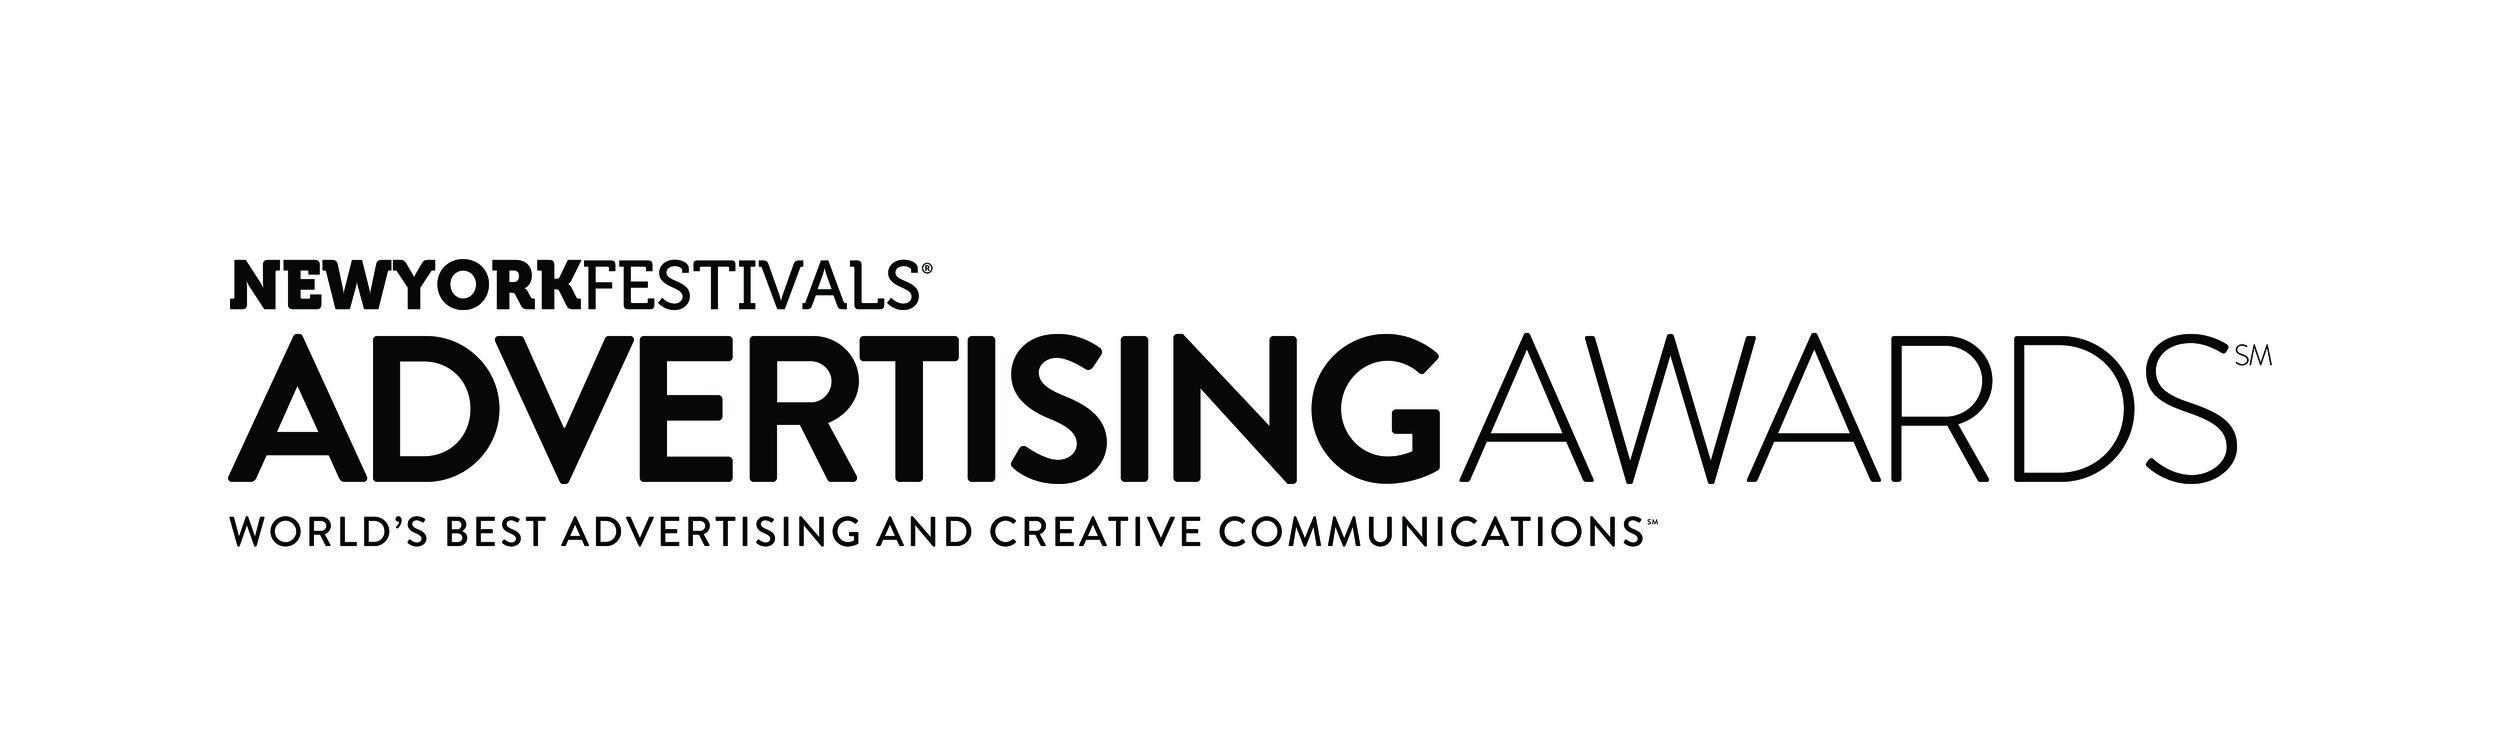 advertising+awards_WHT copy2.jpg